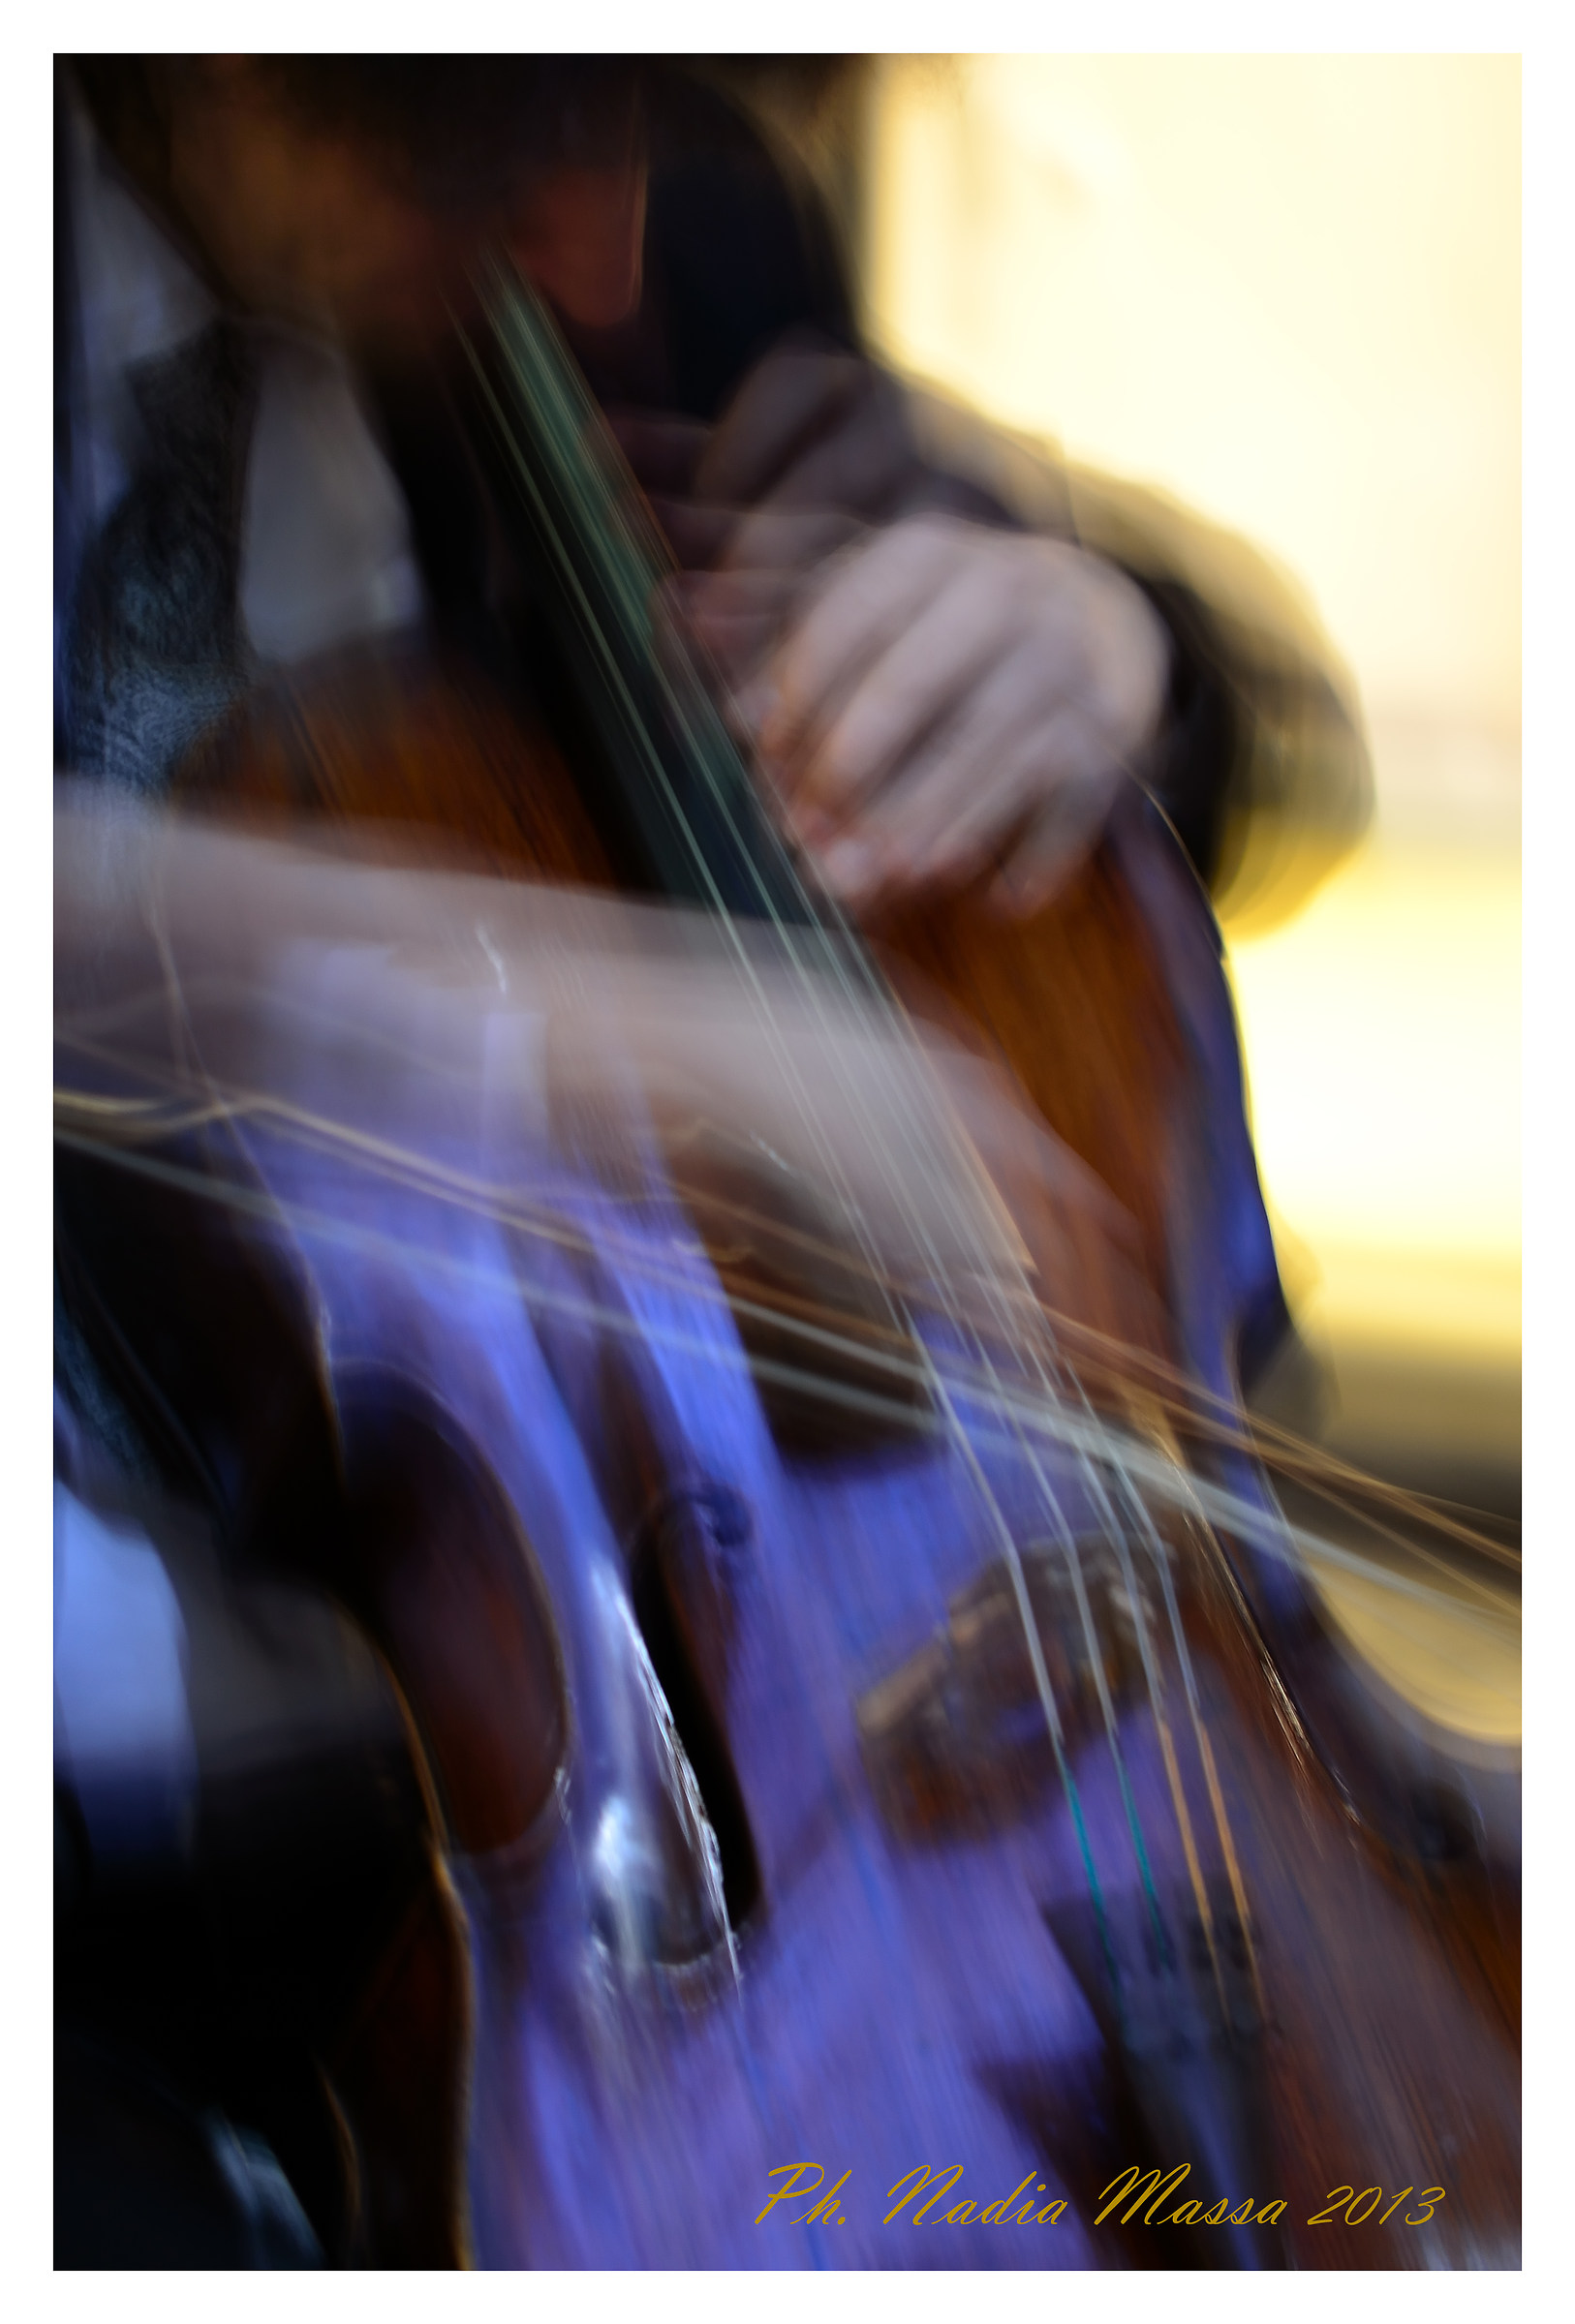 Vortices of music!...